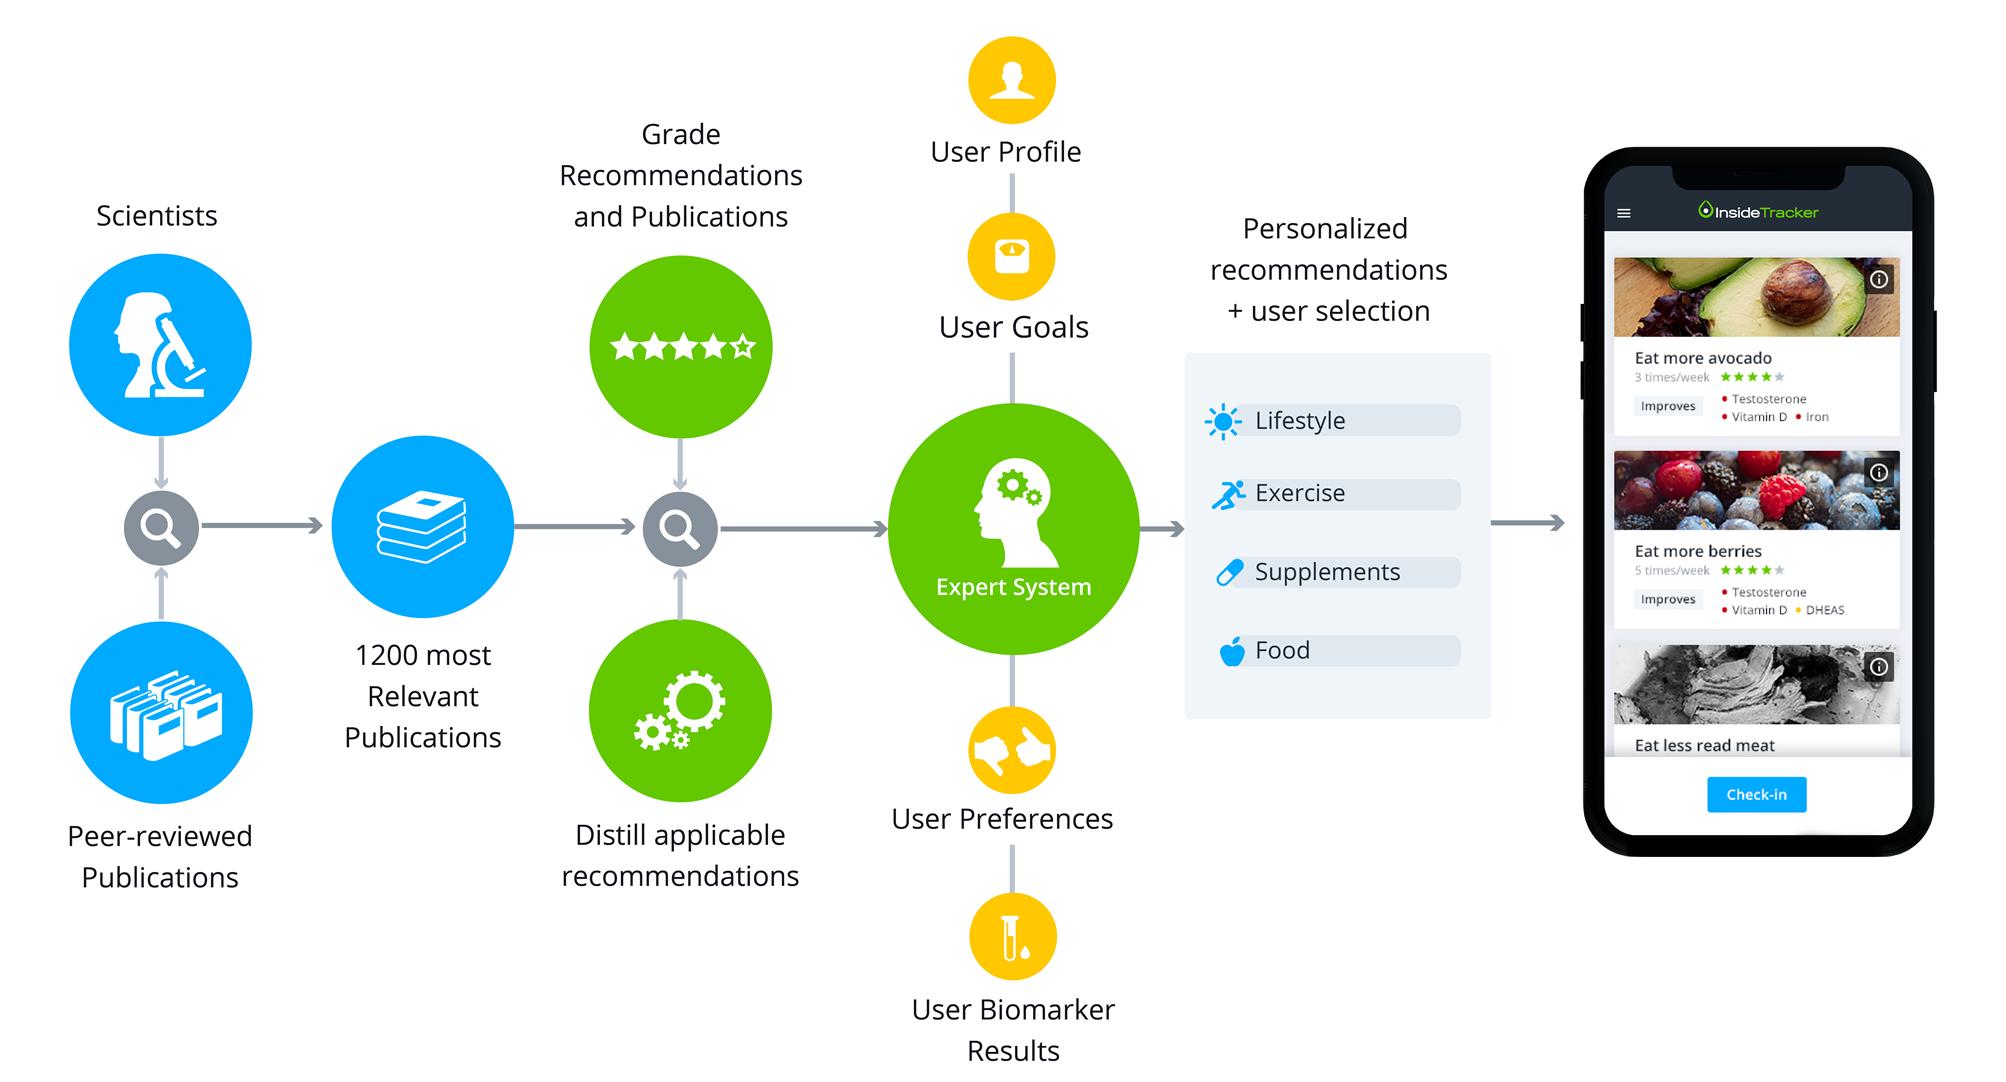 Graphical description of the InsideTracker algorithm and platform